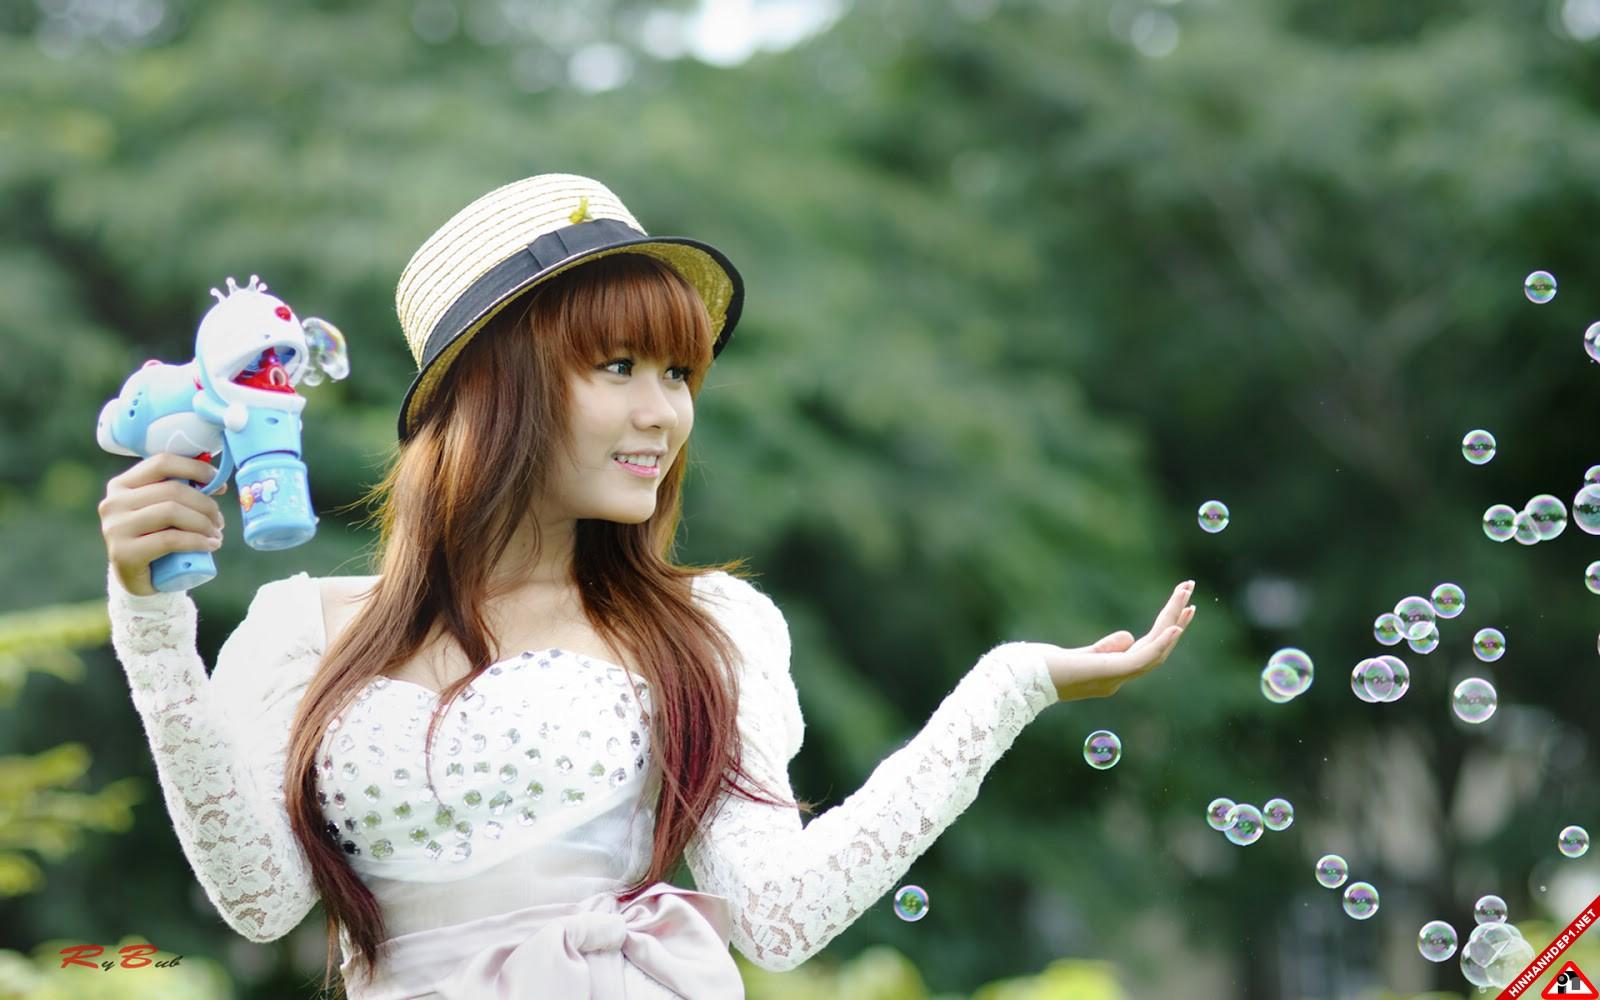 bo-anh-girl-xinh-cung-huong-dong-gio-noi (7)